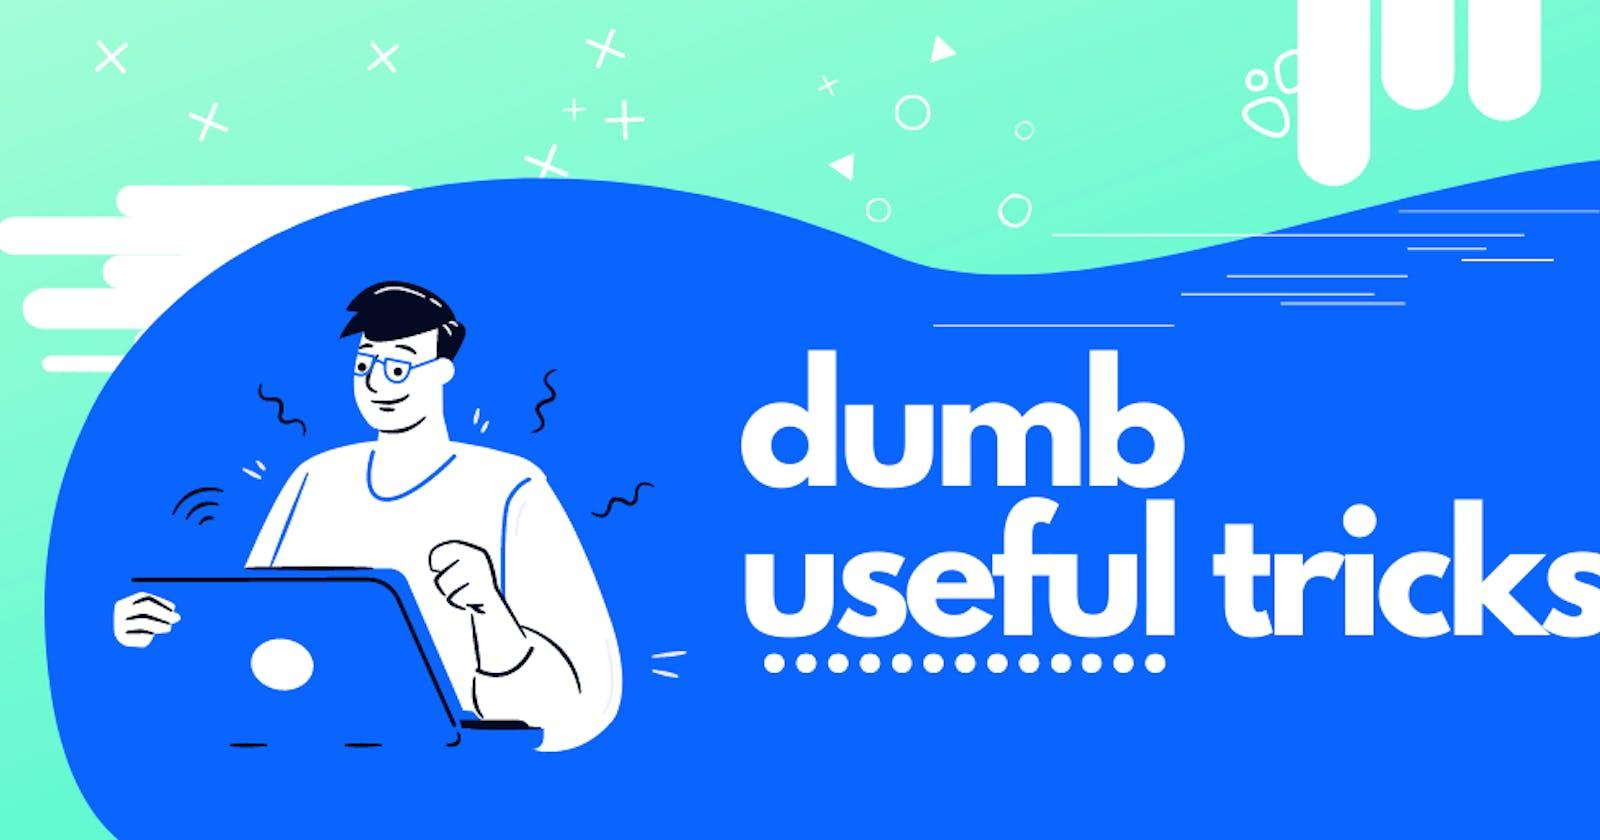 Dumb useful tricks